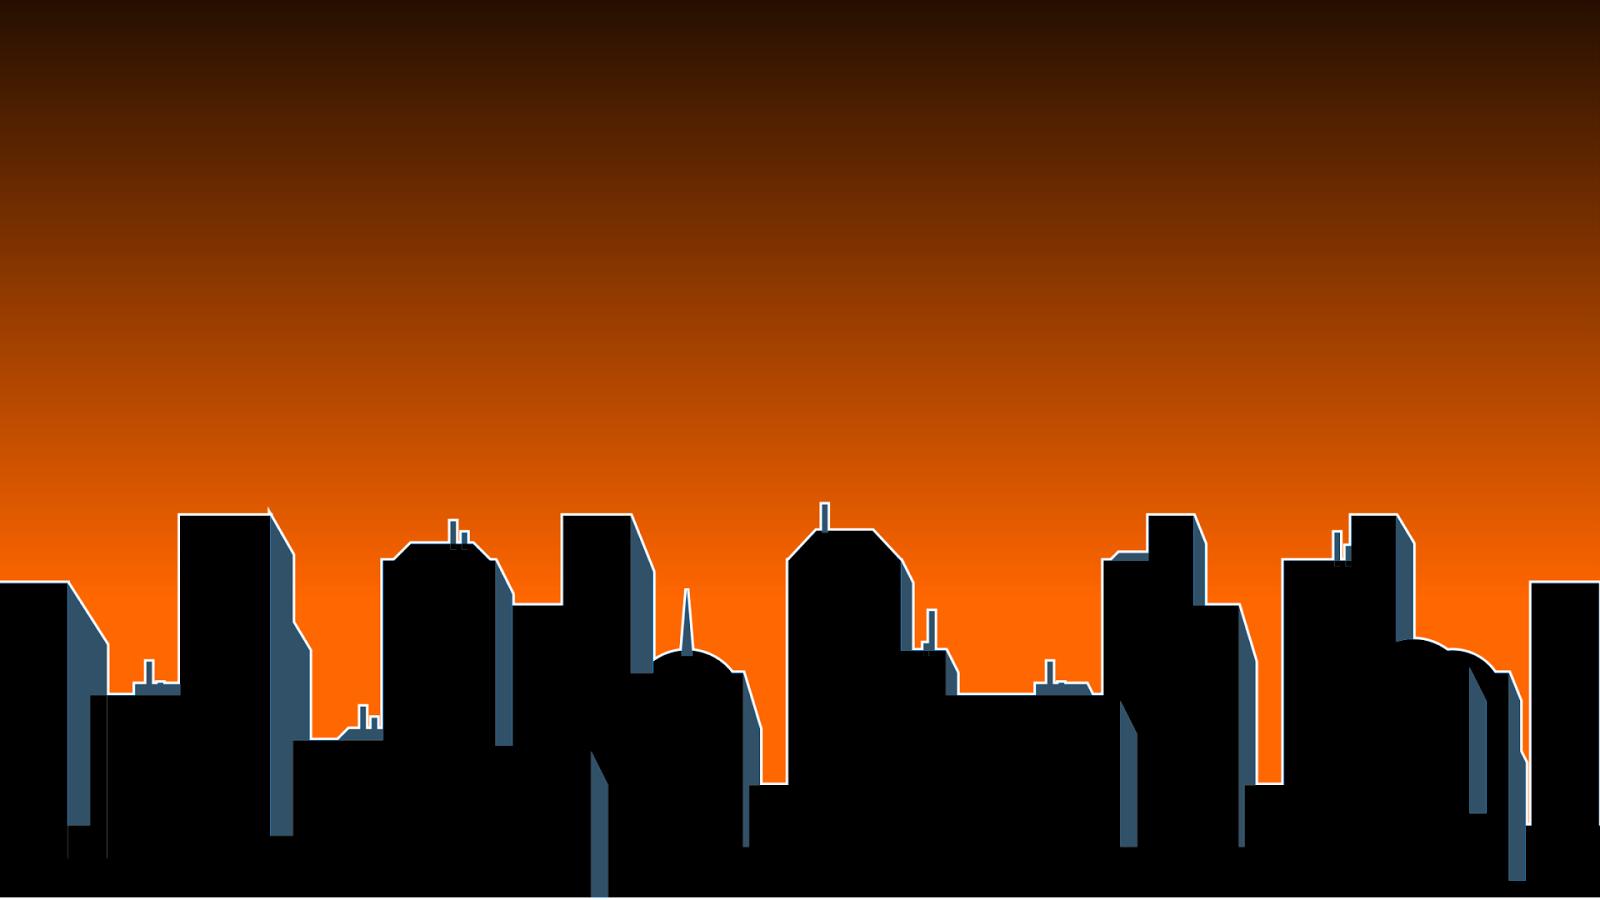 Ubuntu Alive, Explore, And Learn : Ultra Flat GTK Theme has been